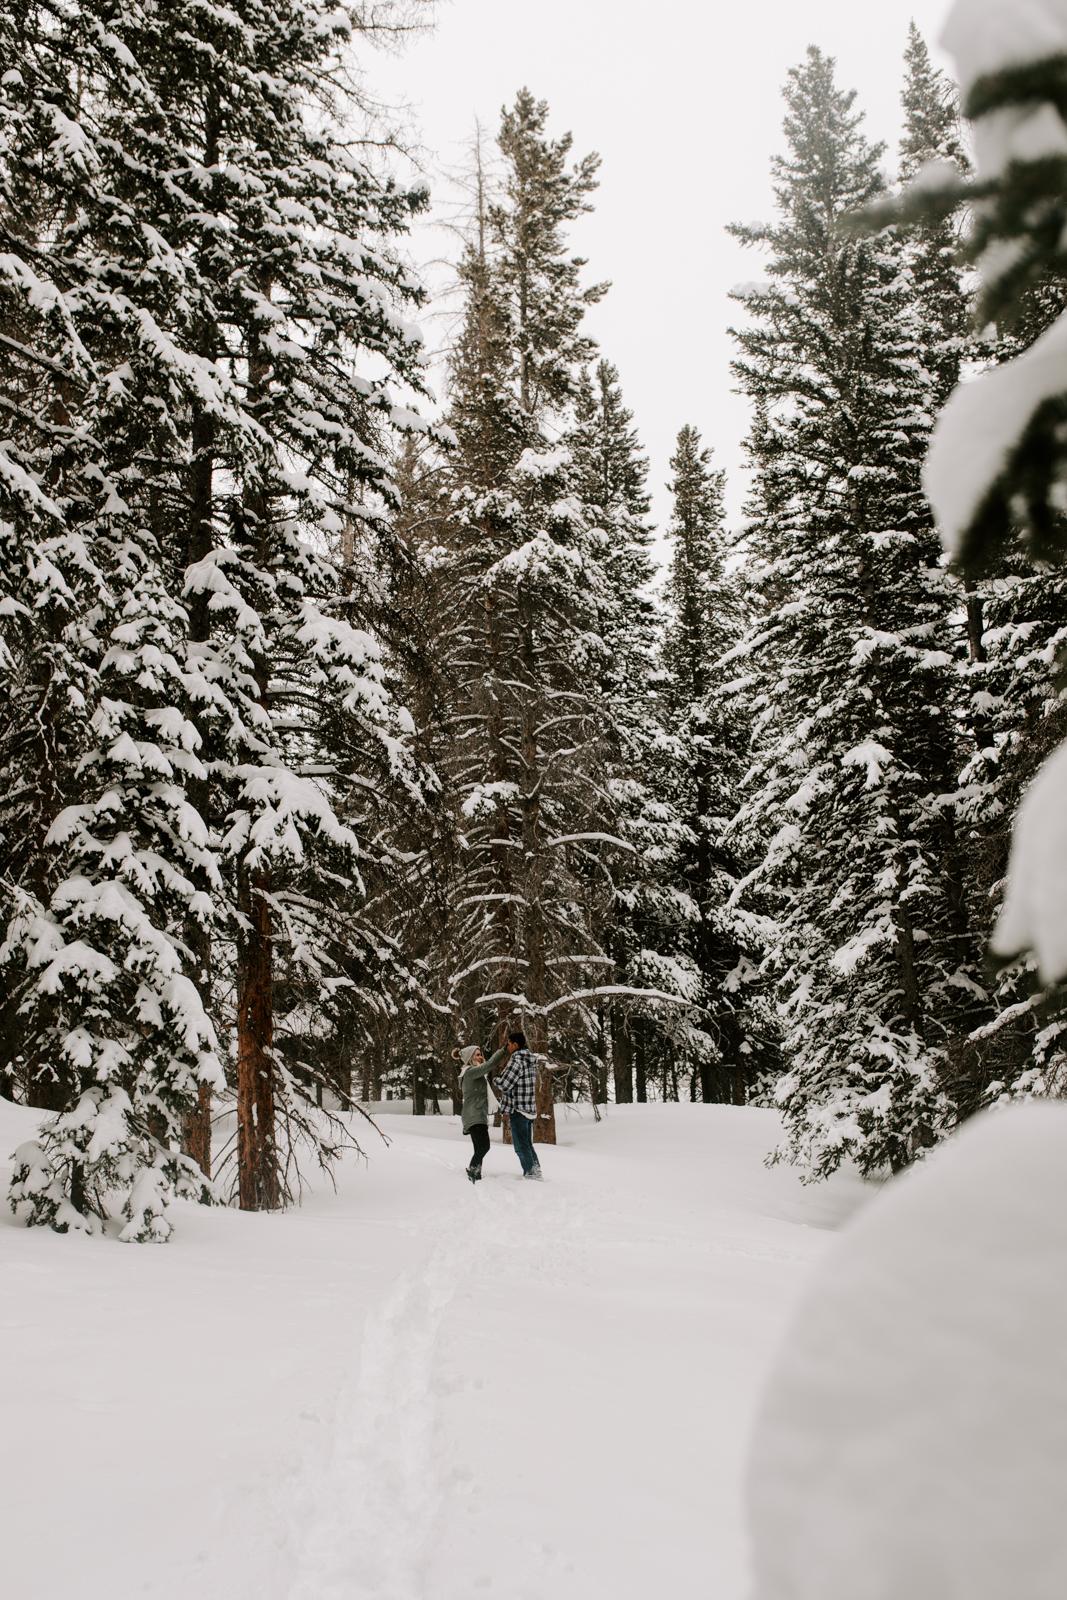 Vanessa & Danny Snow Rocky Mountain National Park Engagement Elopement Photography Photographer-5.jpg